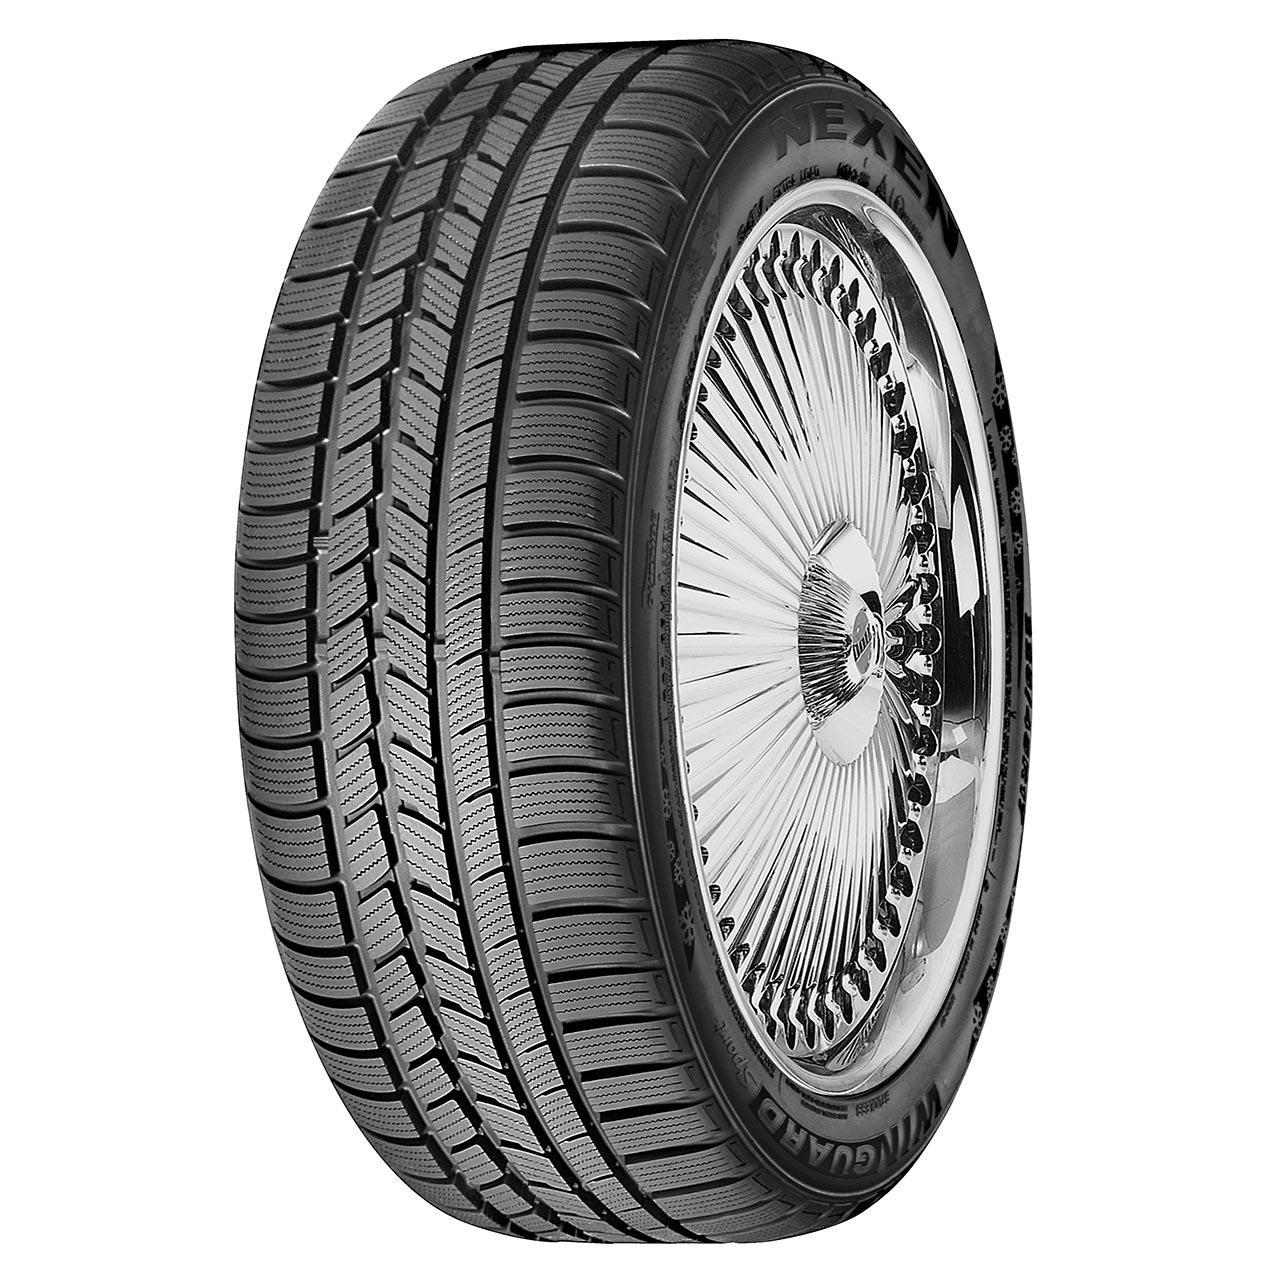 Nexen Winguard Sport 215/55R17 98V XL